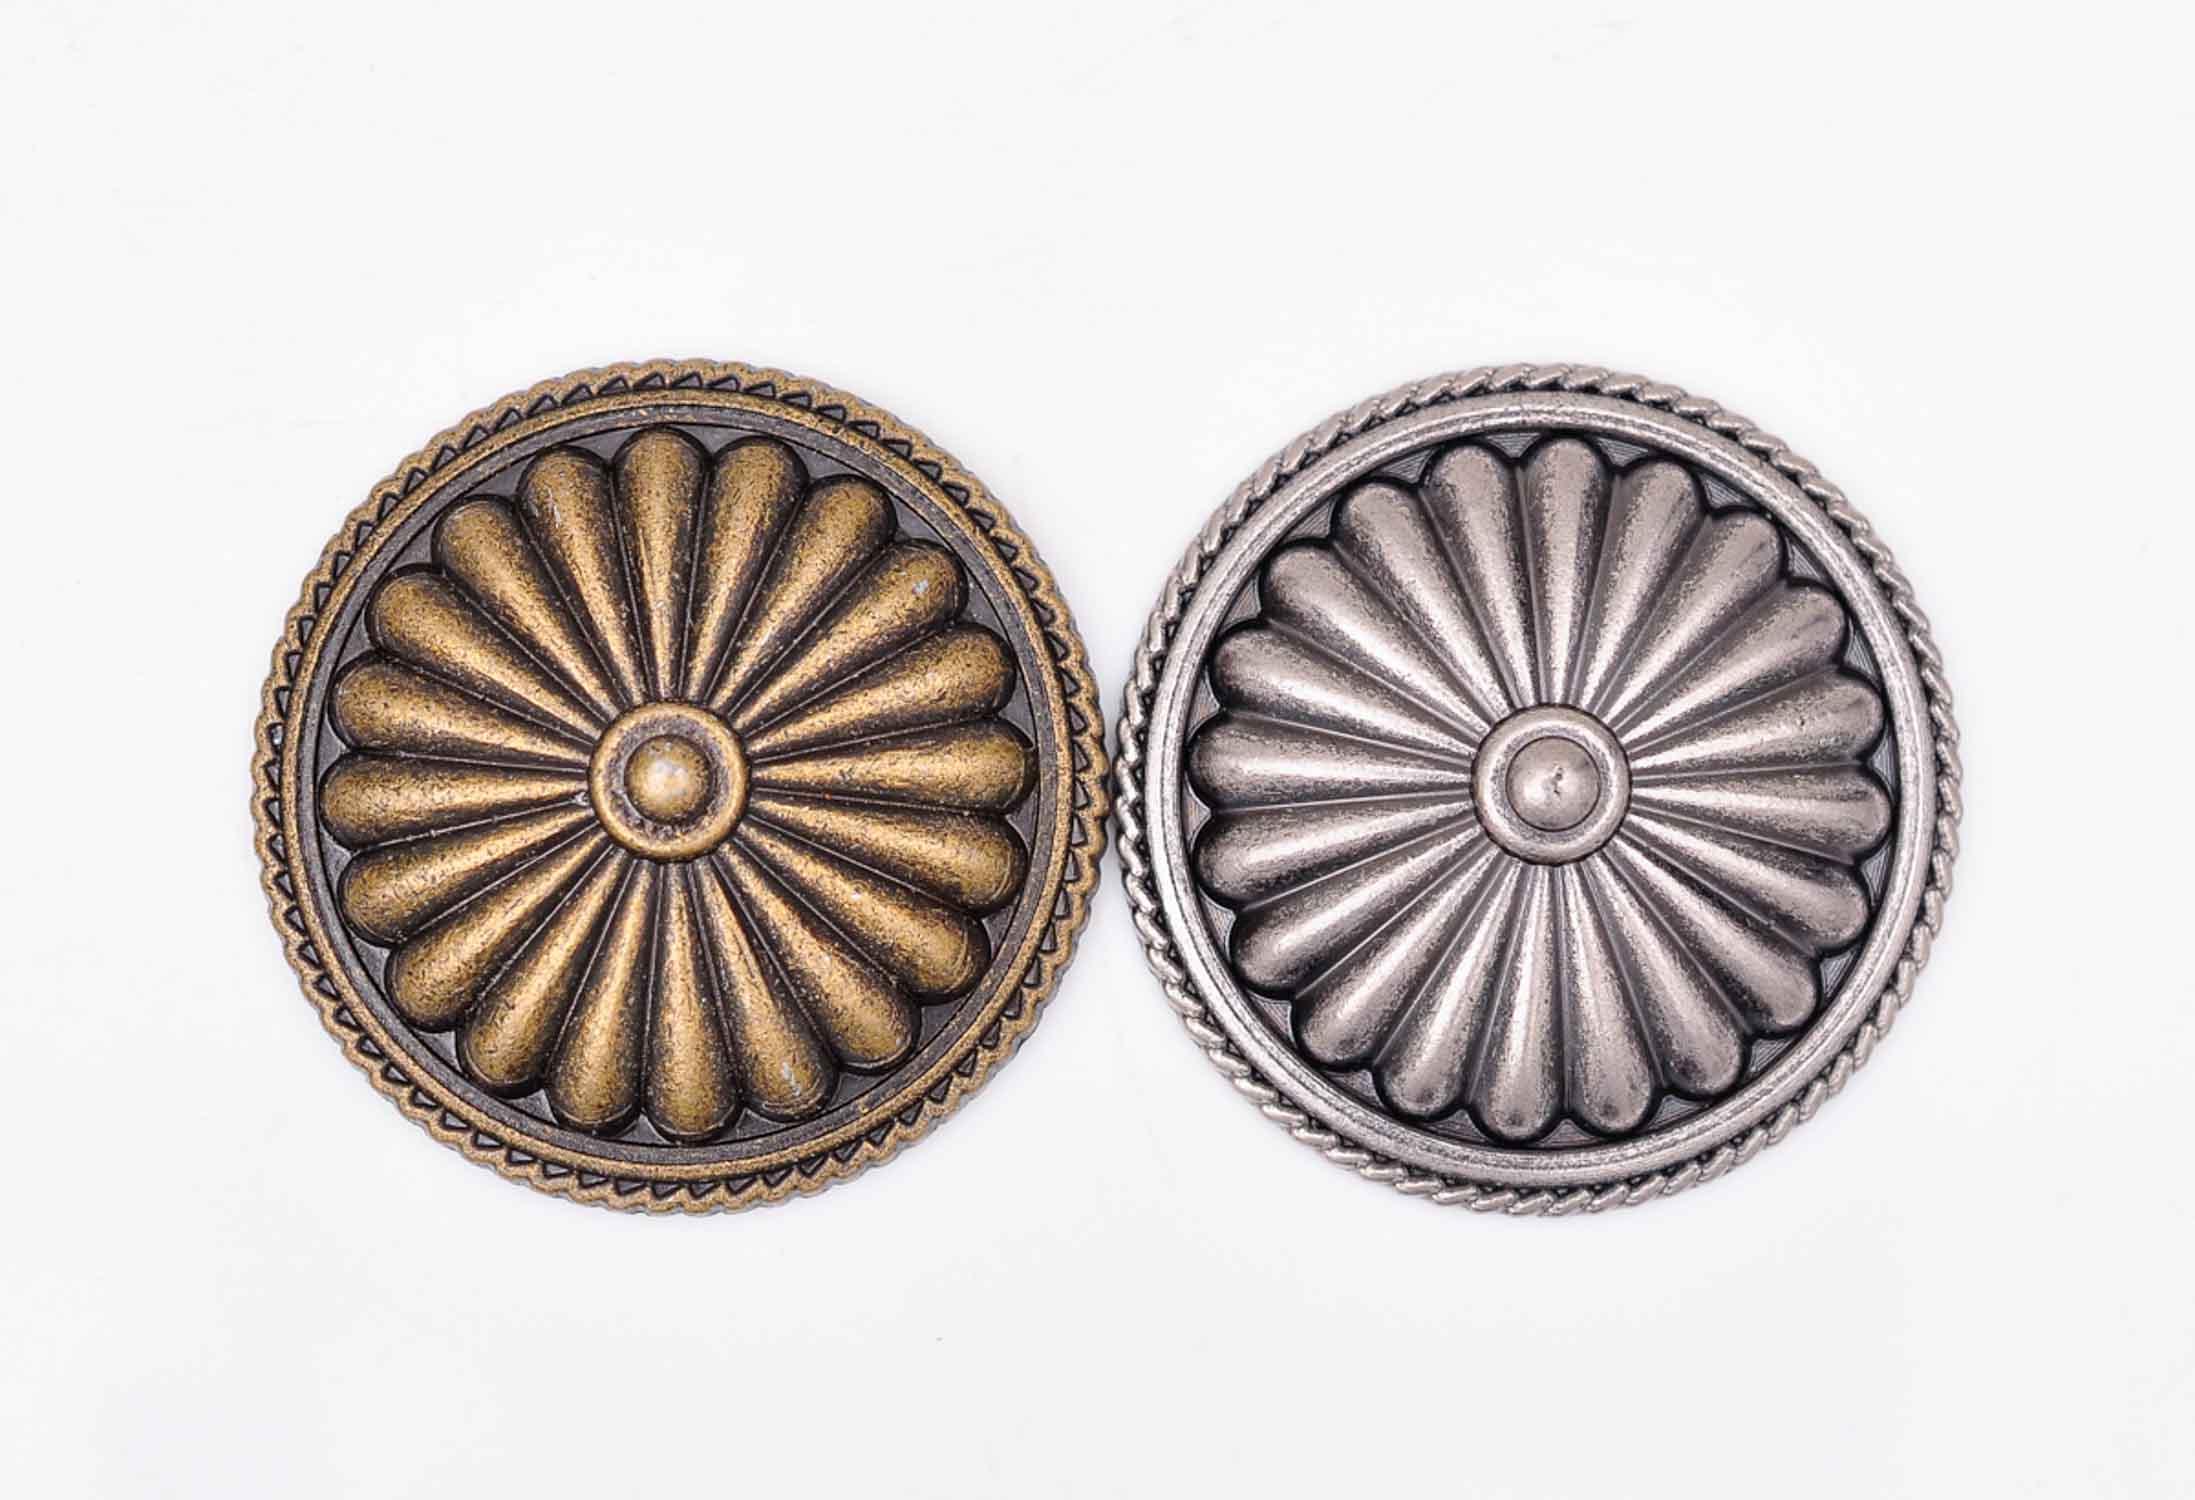 "10 piezas 1-3/8 ""35 MM Rivetback plata antigua/latón flor Tribal occidental cuero bolso cartera cinturón silla Concho Decoración"